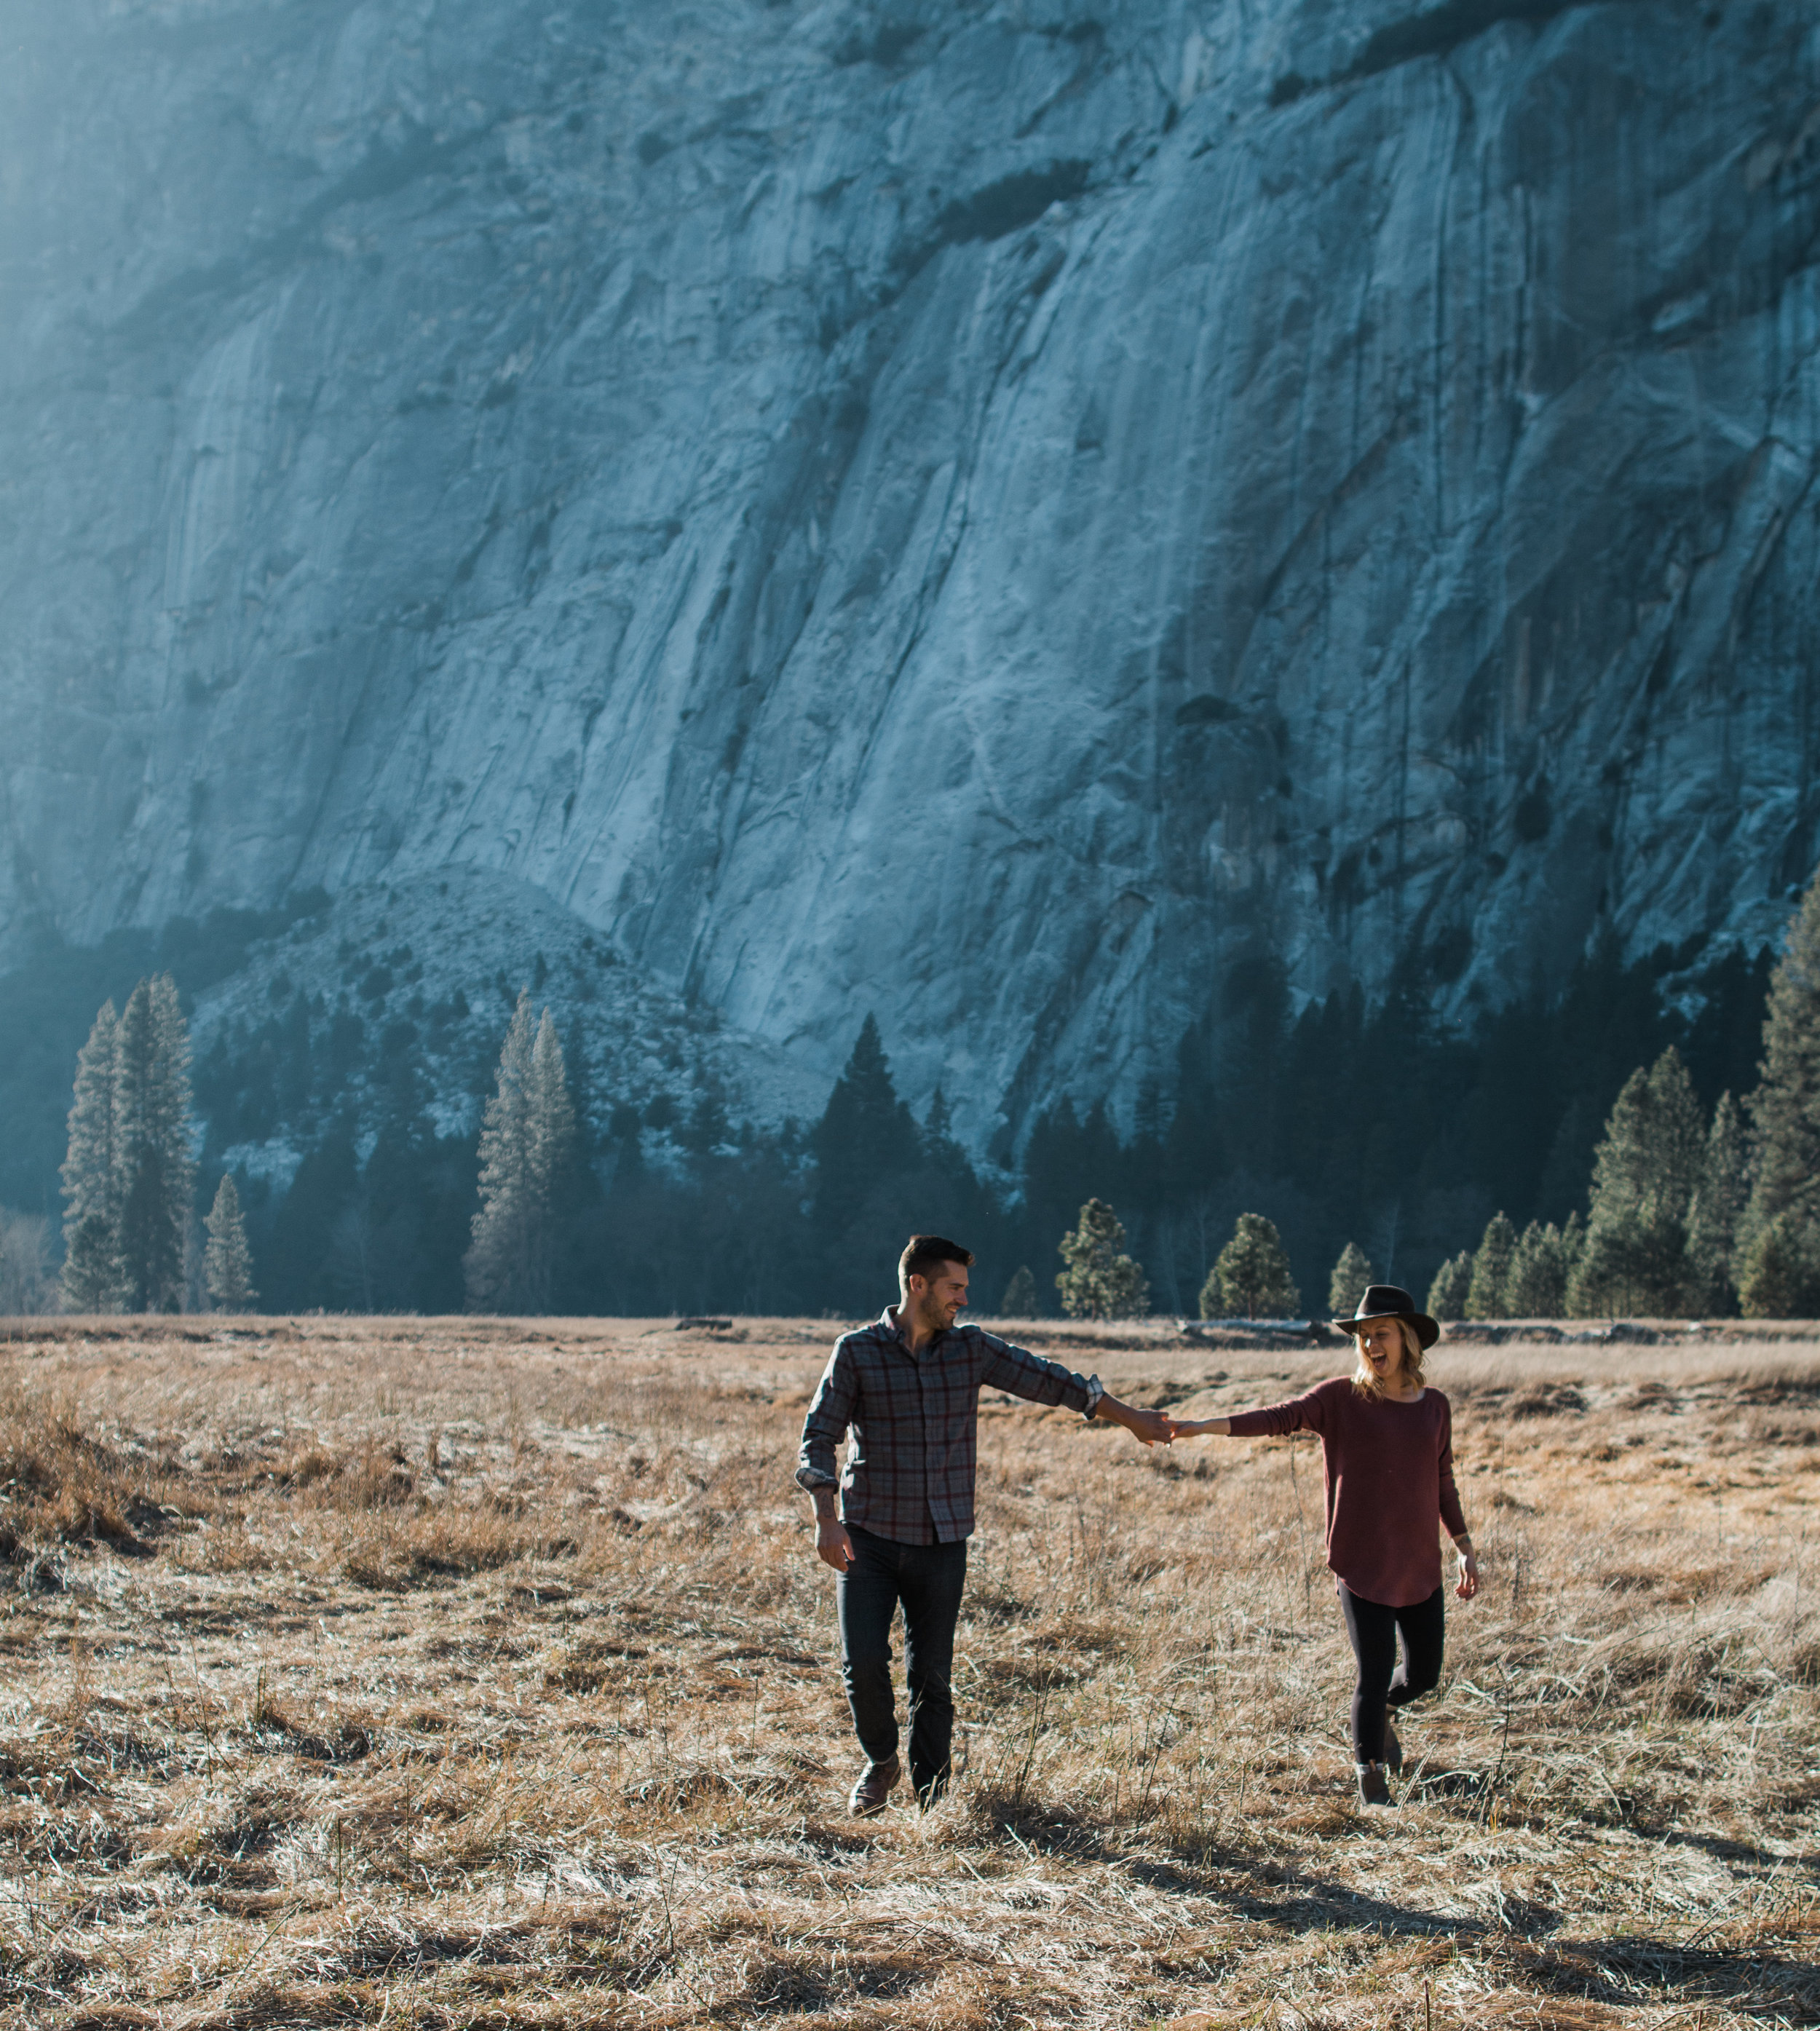 Yosemite national park adventure engagement session